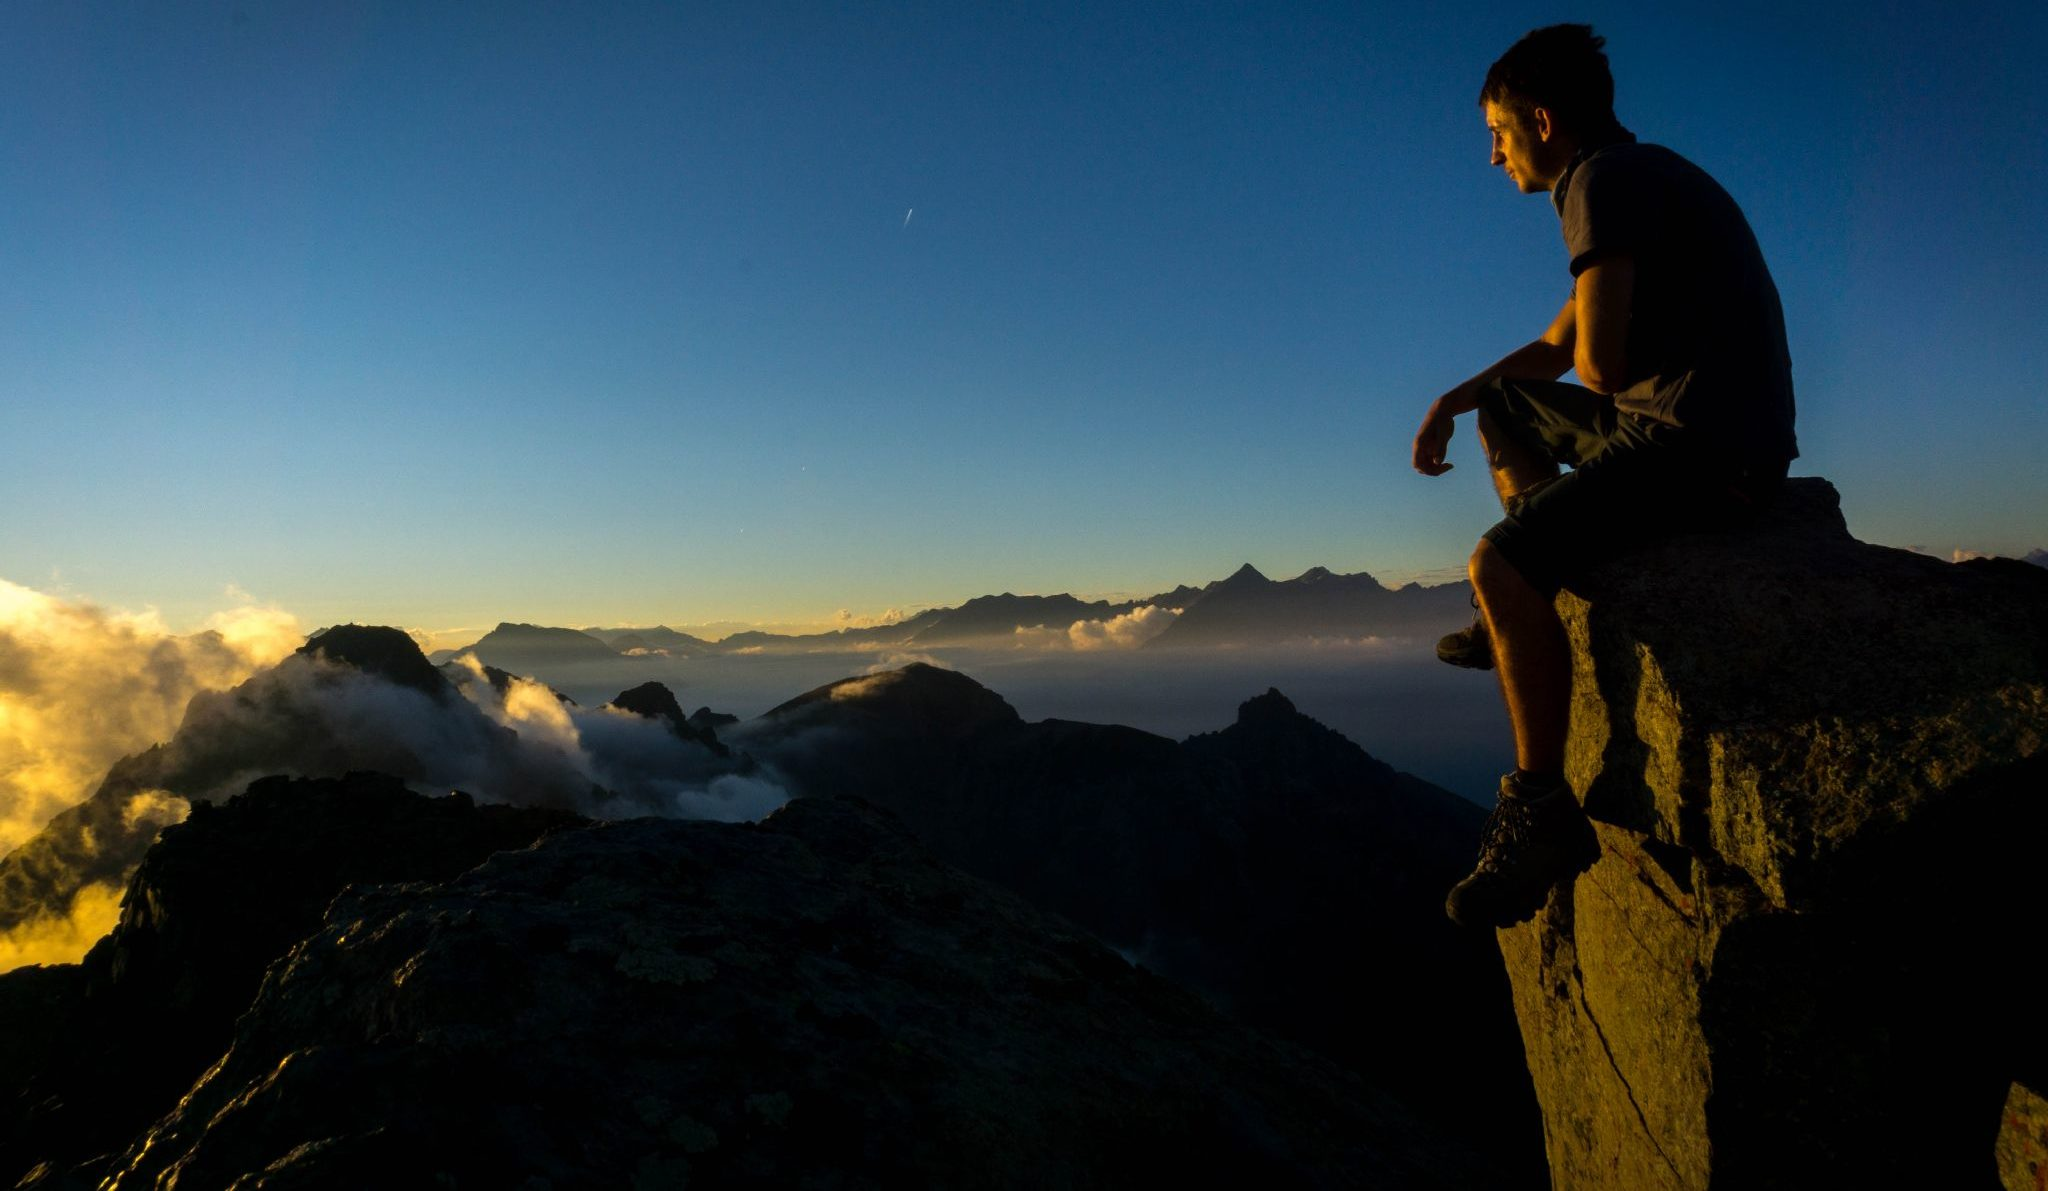 Trekking Alps and COVID-19: Update